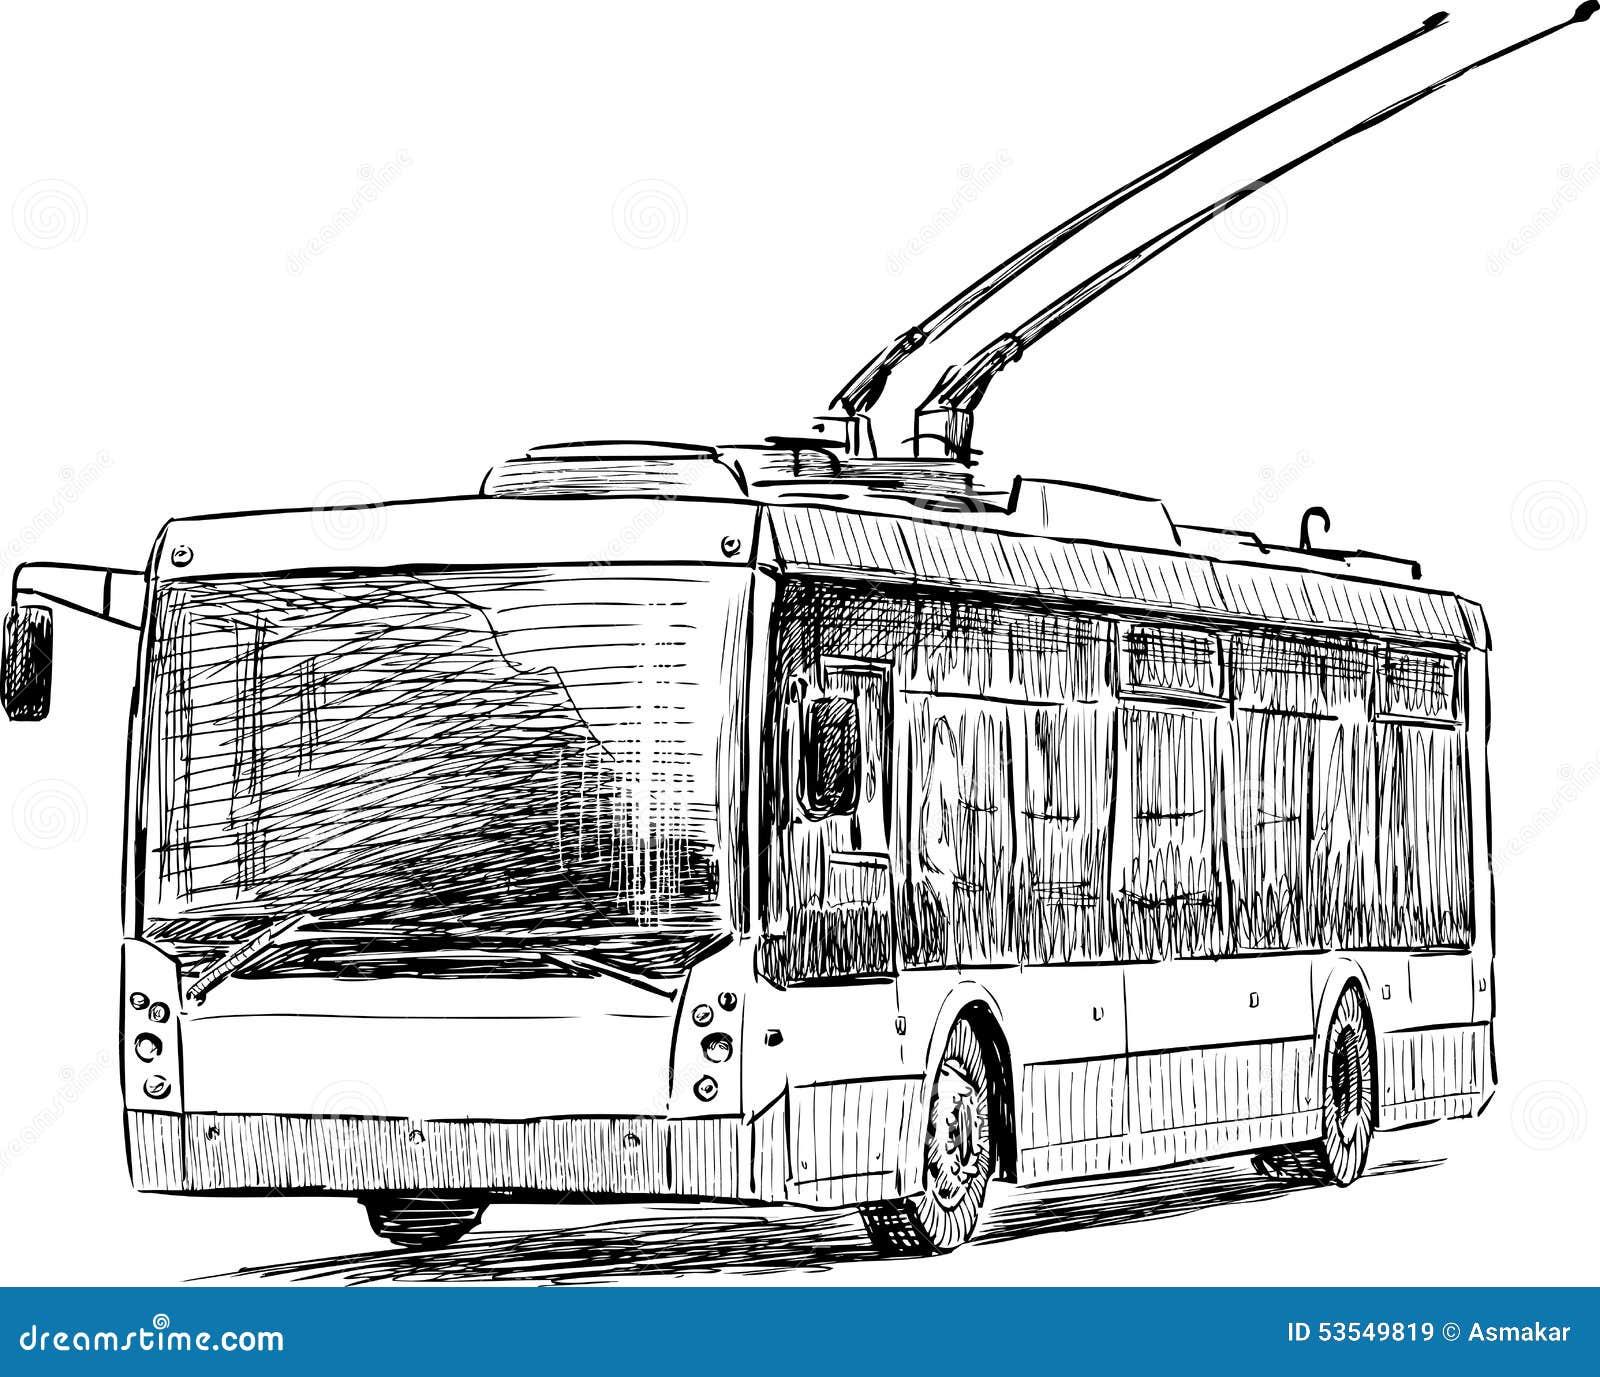 City trolleybus stock vector. Illustration of sketch - 53549819